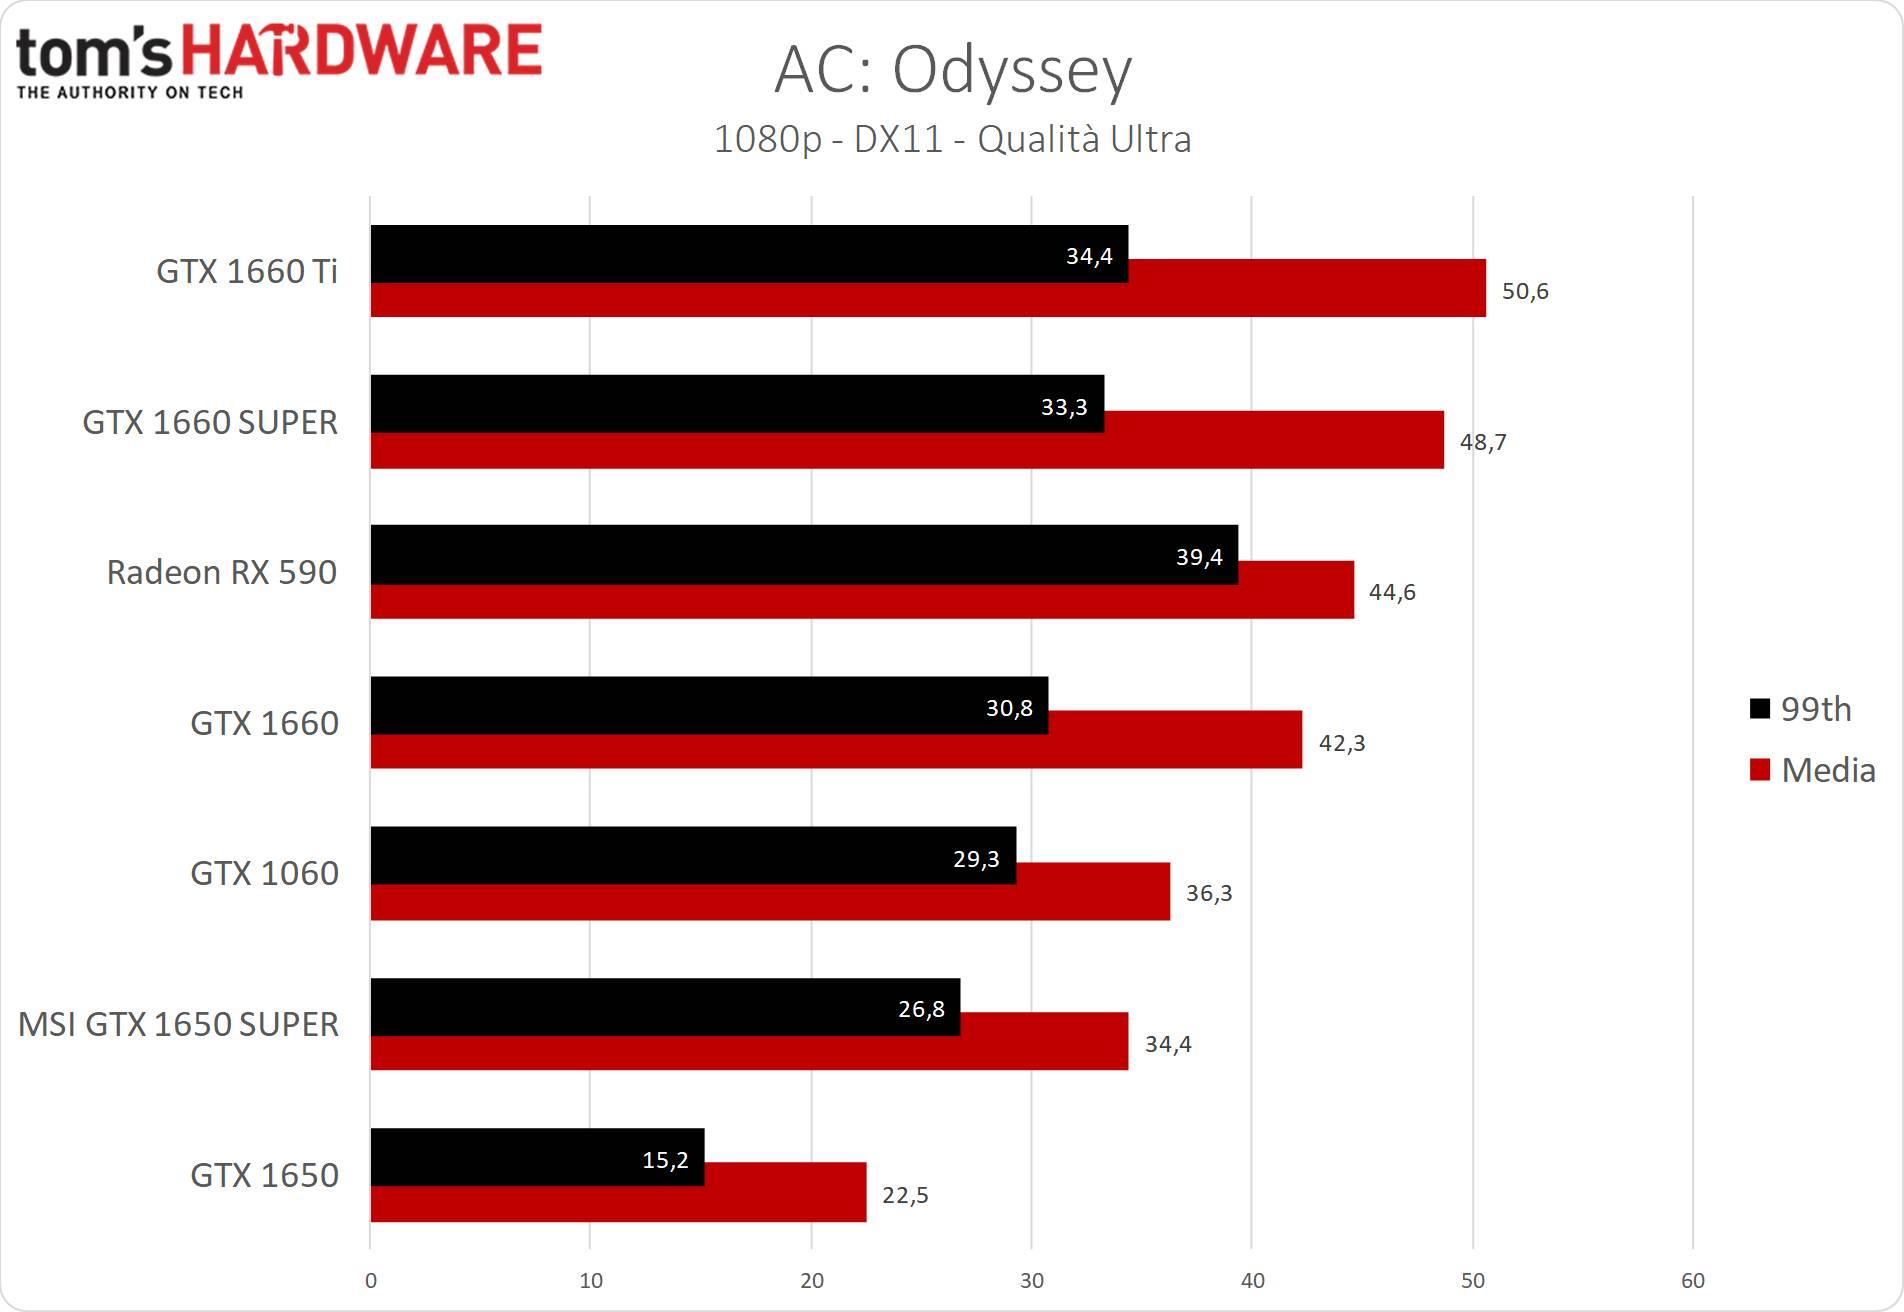 GeForce GTX 1650 SUPER AC Odyssey